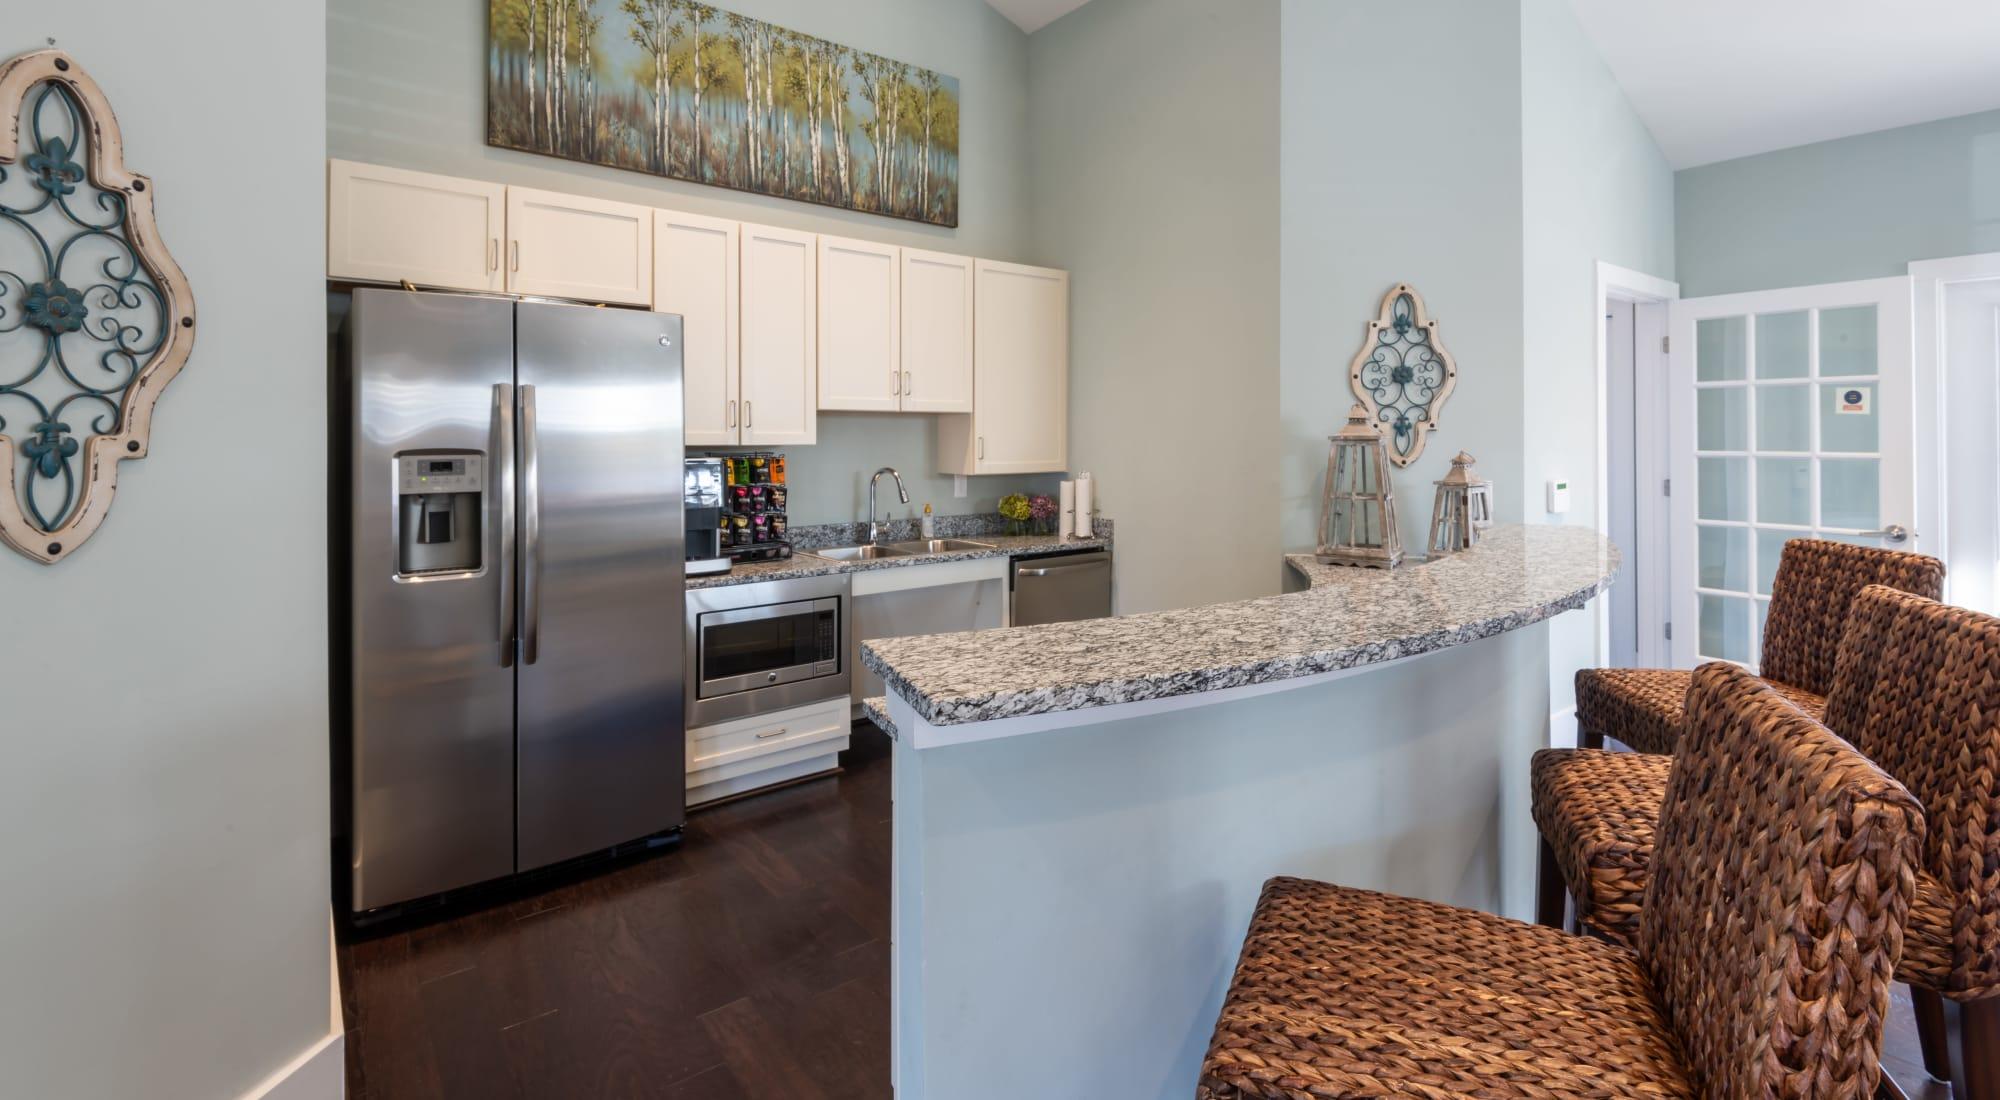 Apartments in Garner, North Carolina at The Reserve at White Oak